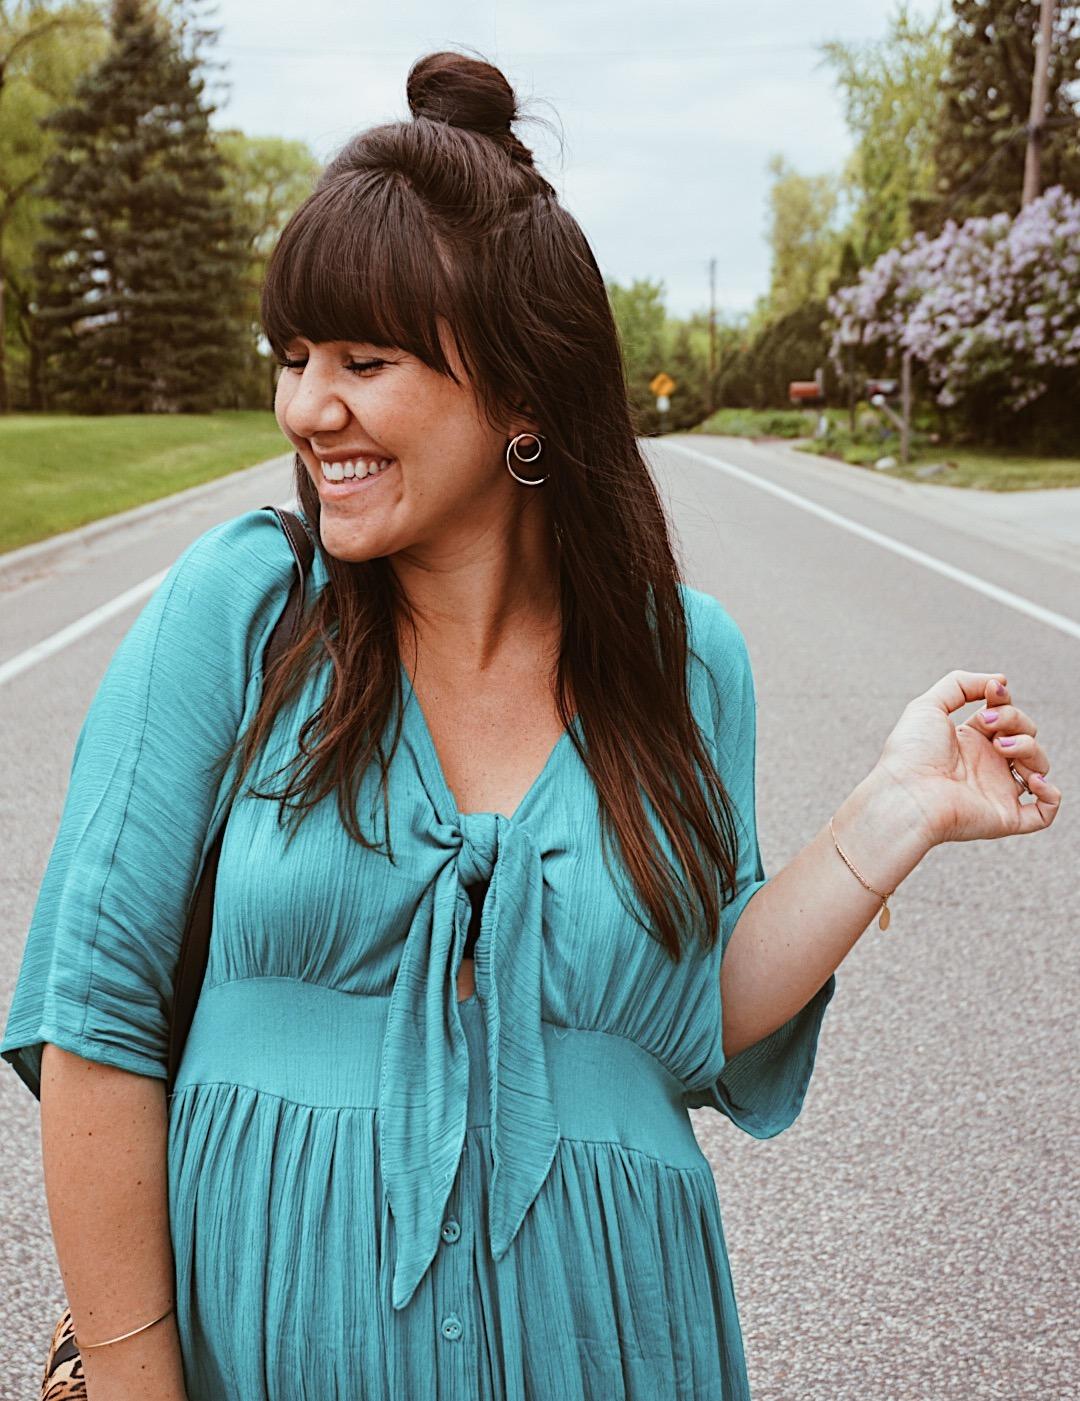 ASOS Maternity Dress & My Summer Favorites | ASOS Sale